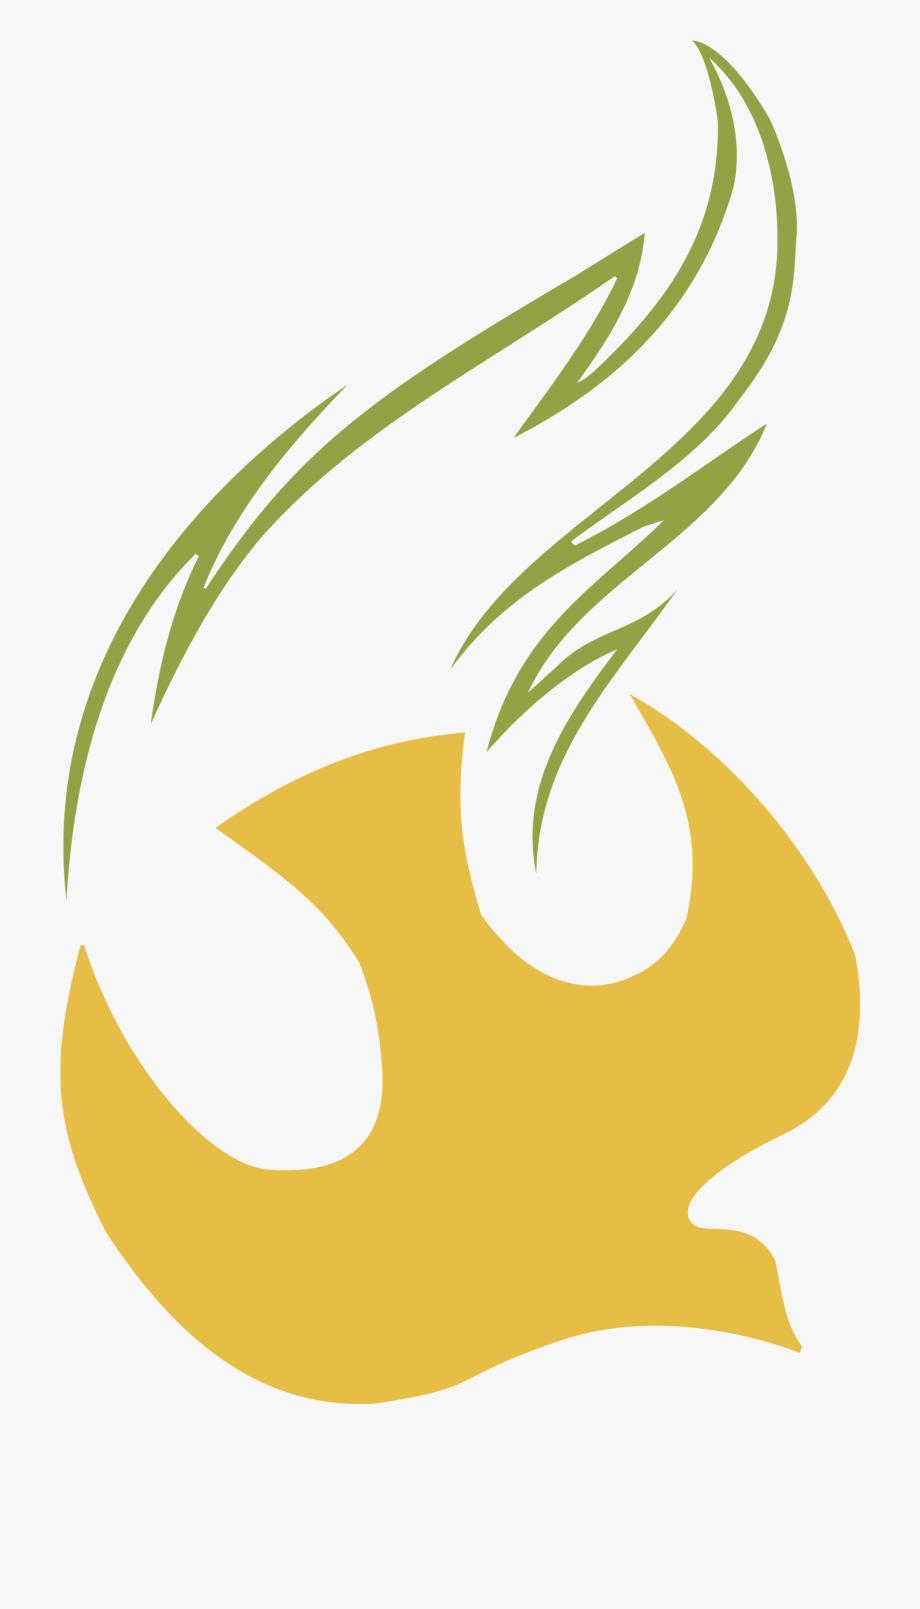 Flames Holy Spirit Flame Clip Art Clipart.